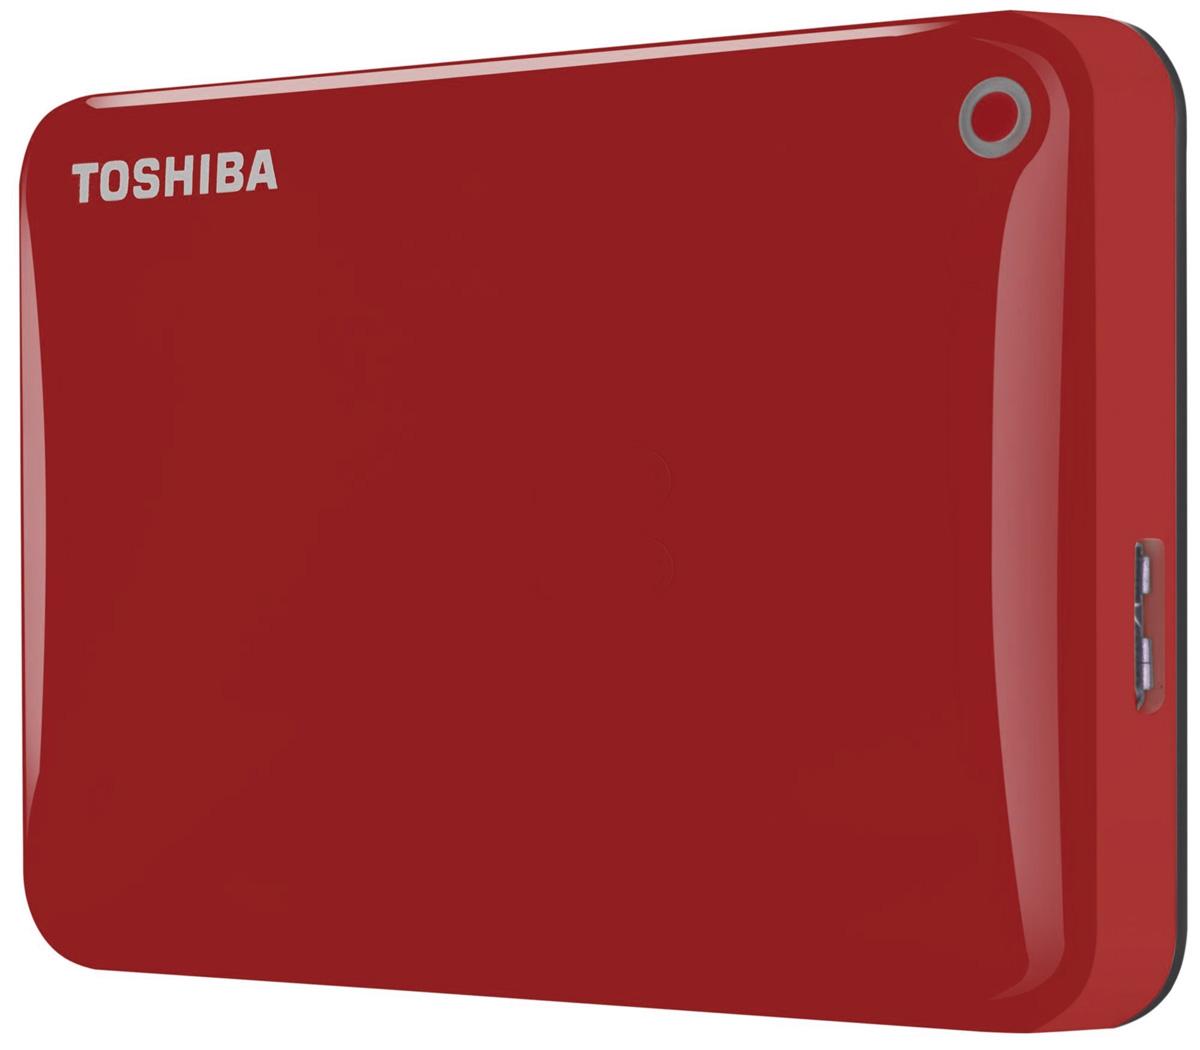 Toshiba Canvio Connect II 500GB, Red внешний жесткий диск (HDTC805ER3AA)